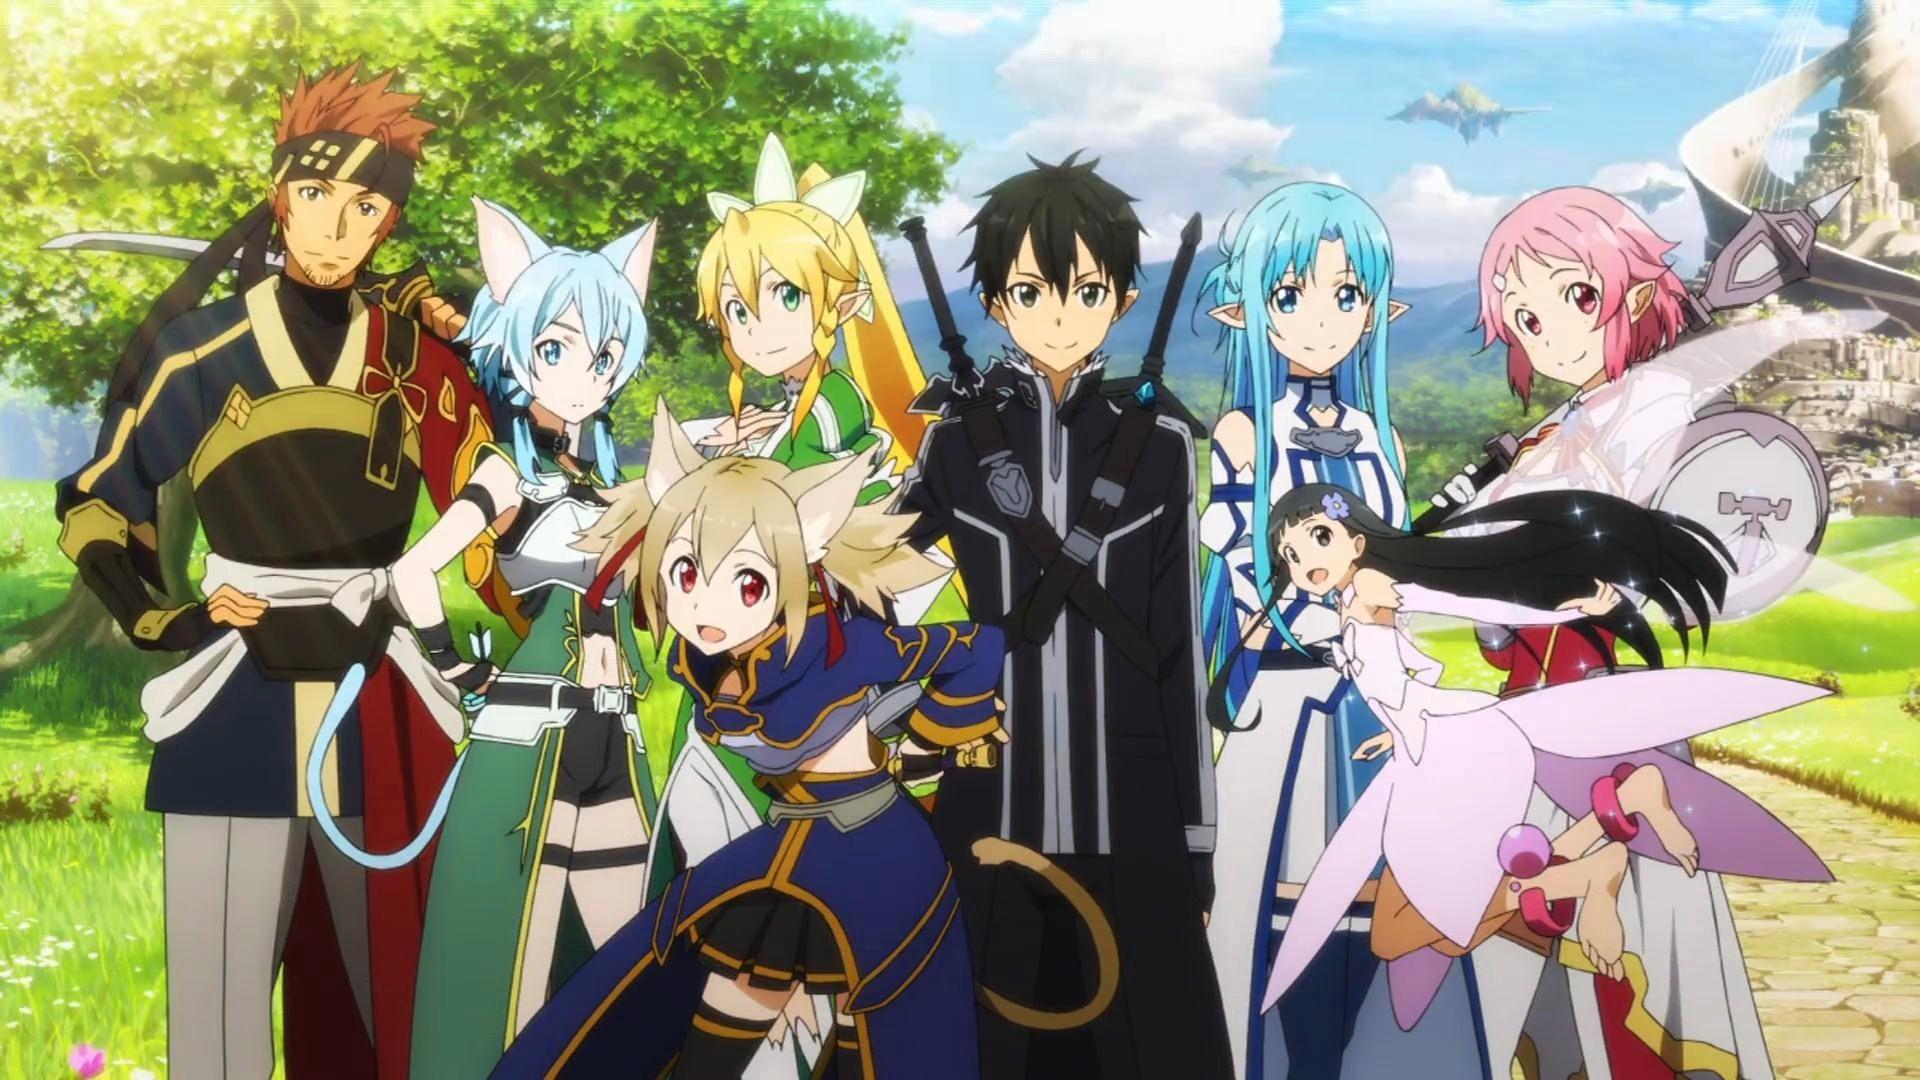 Anime Sao Characters